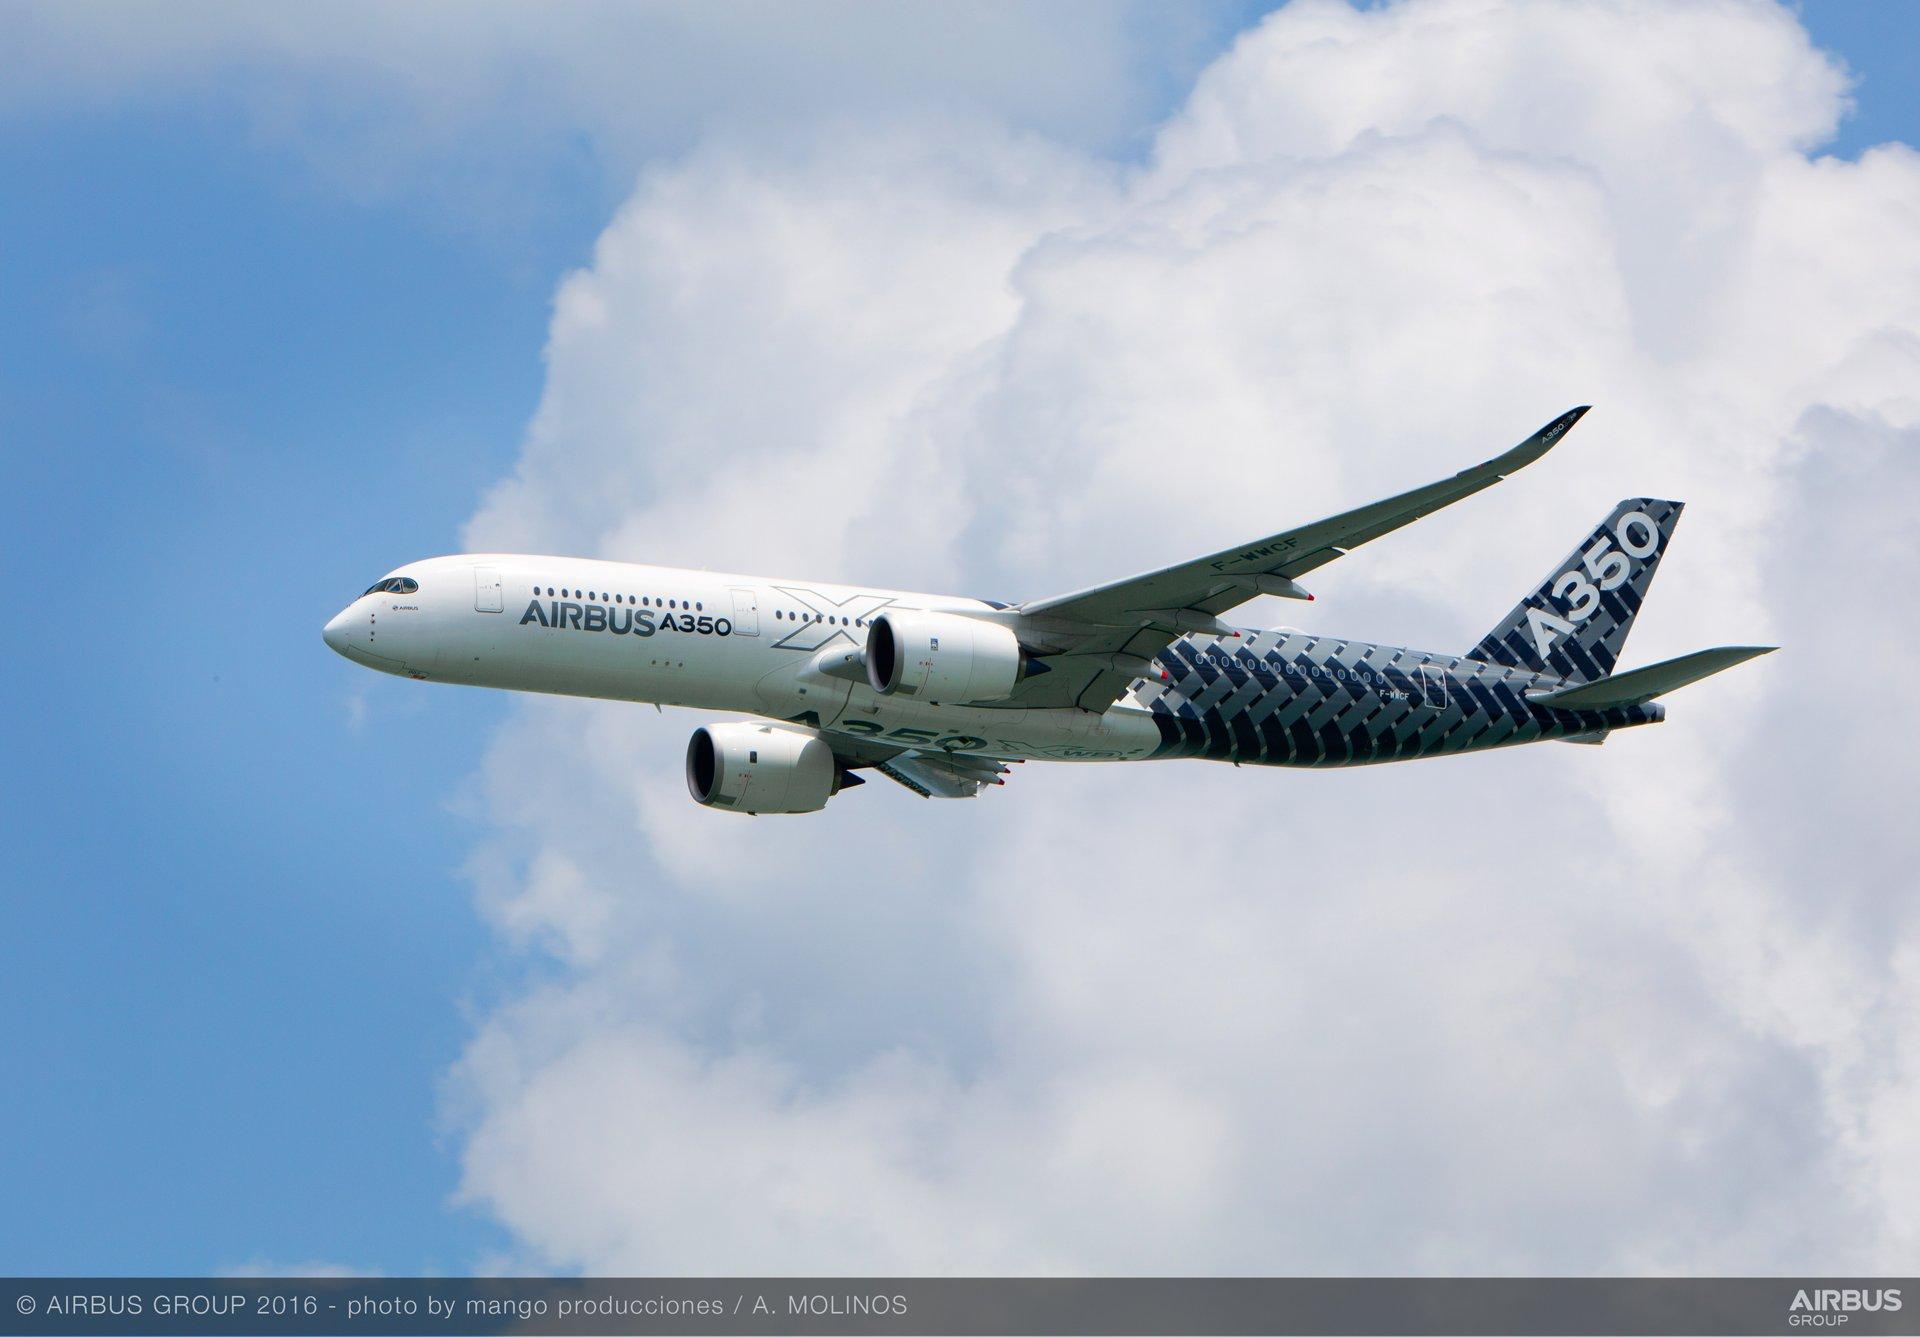 Singapore Airshow 2016_A350 XWB flying display 3